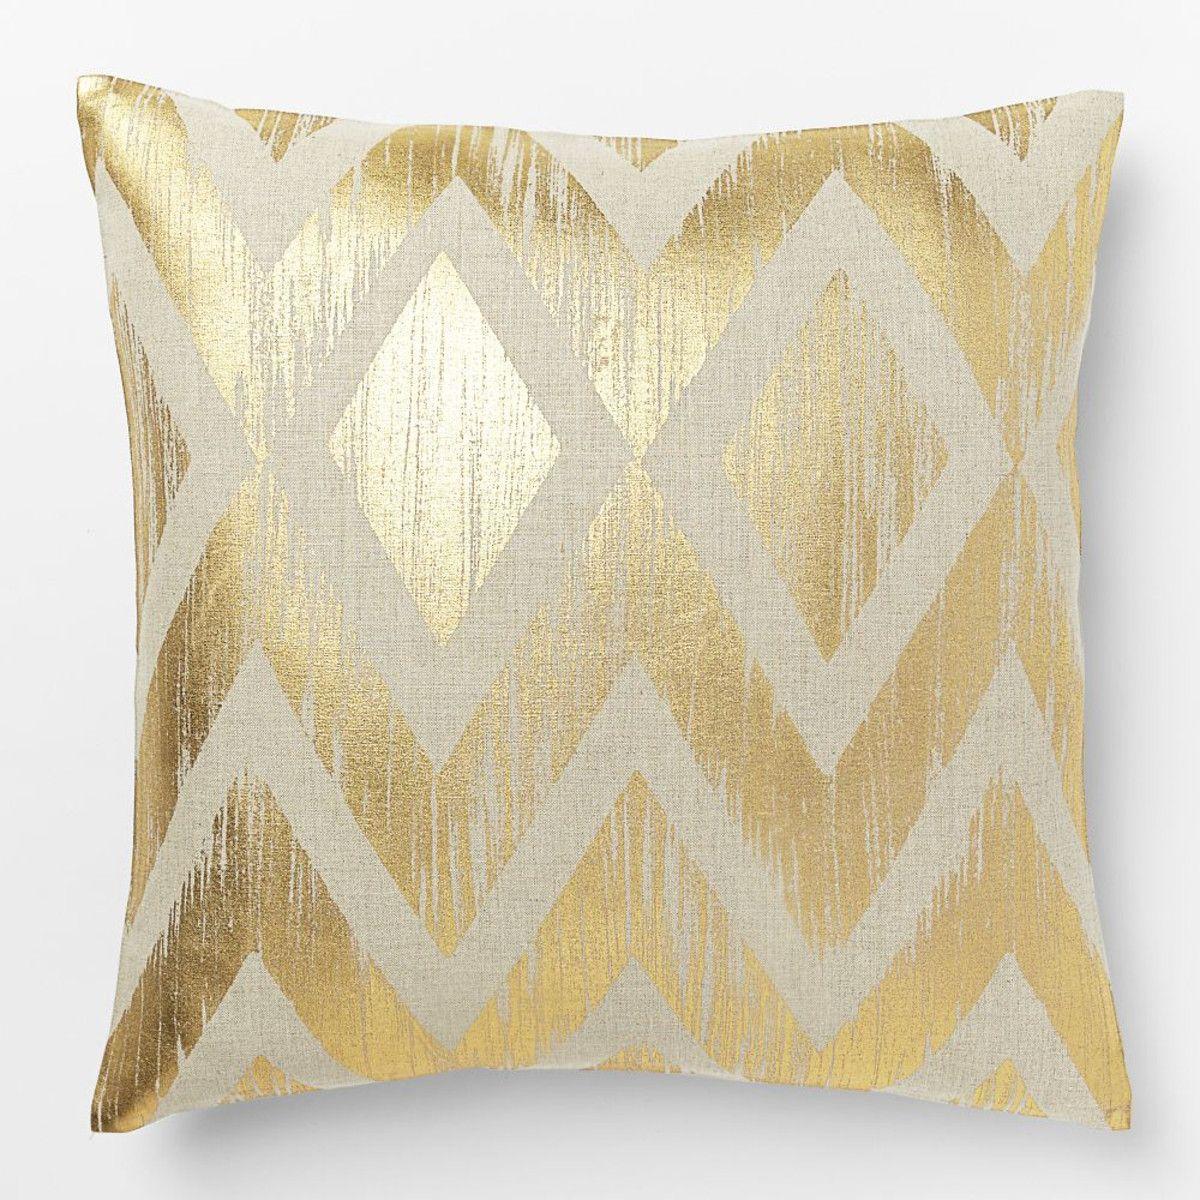 indoor decor market xxx accent category pillow home world pillows gold macrame natural throw do outdoor decorative